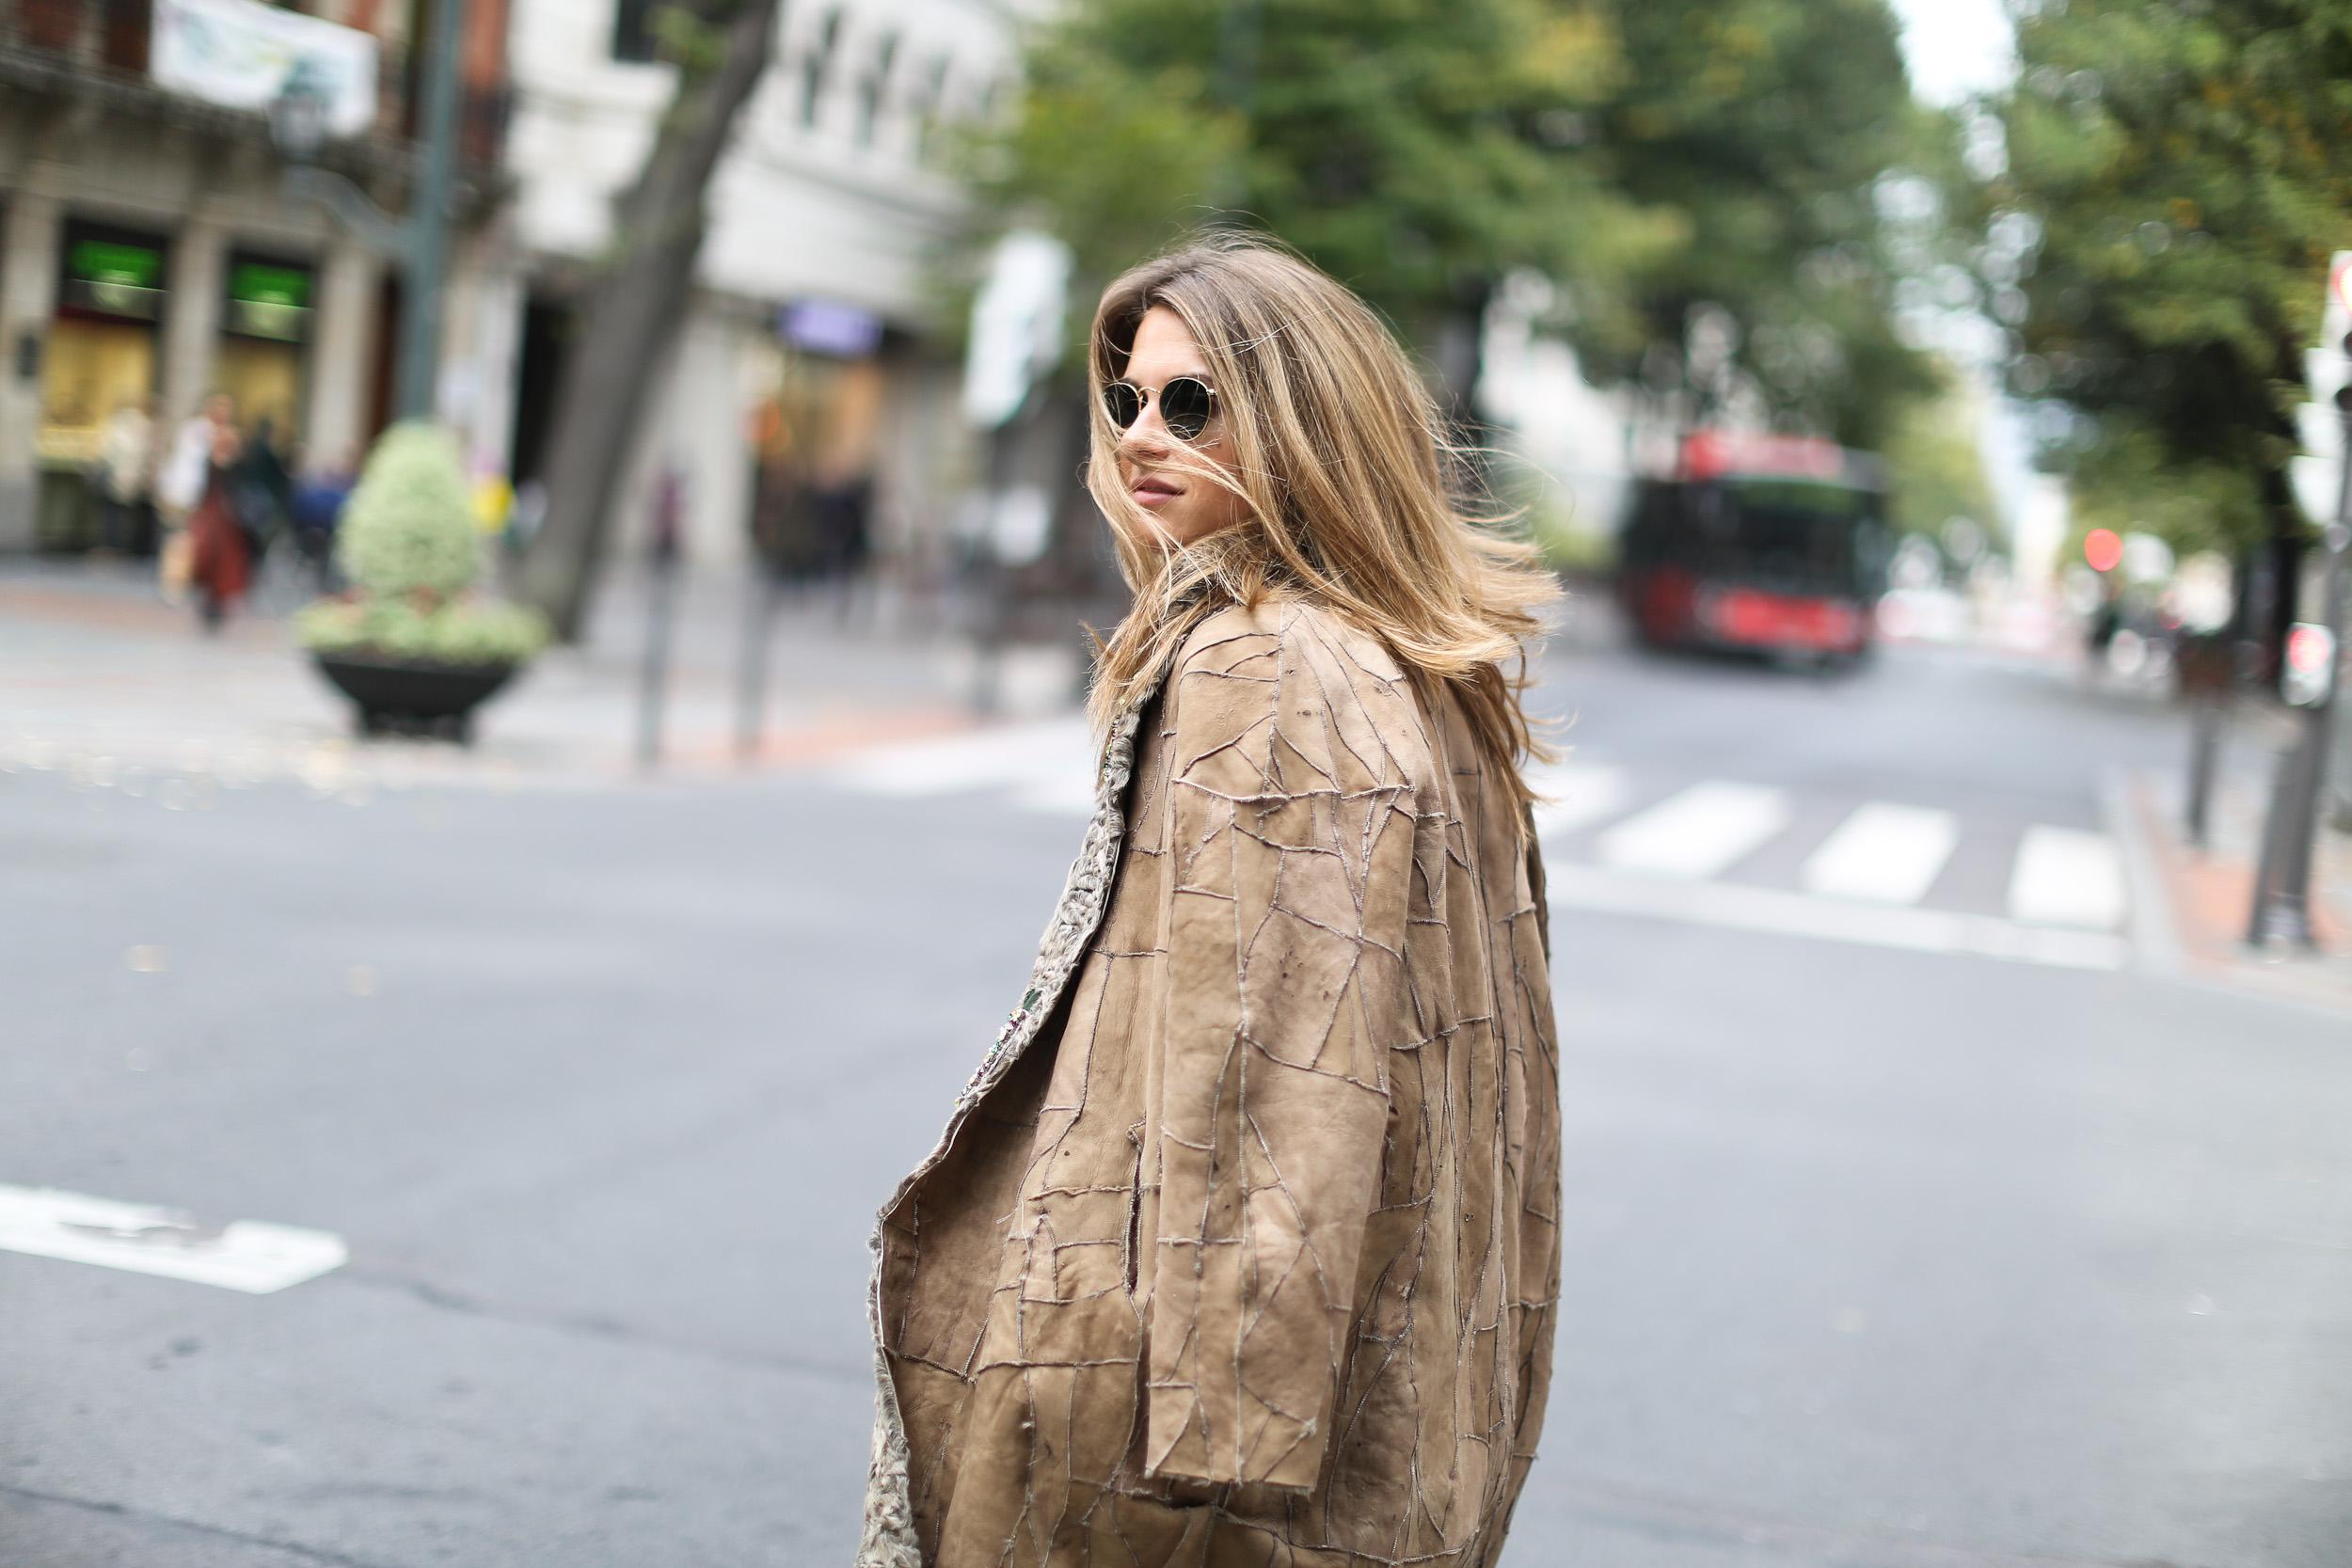 Clochet_streetstyle_boxcalf_chaqueta_ante_pelo_astracan_kalam_bilbao-10